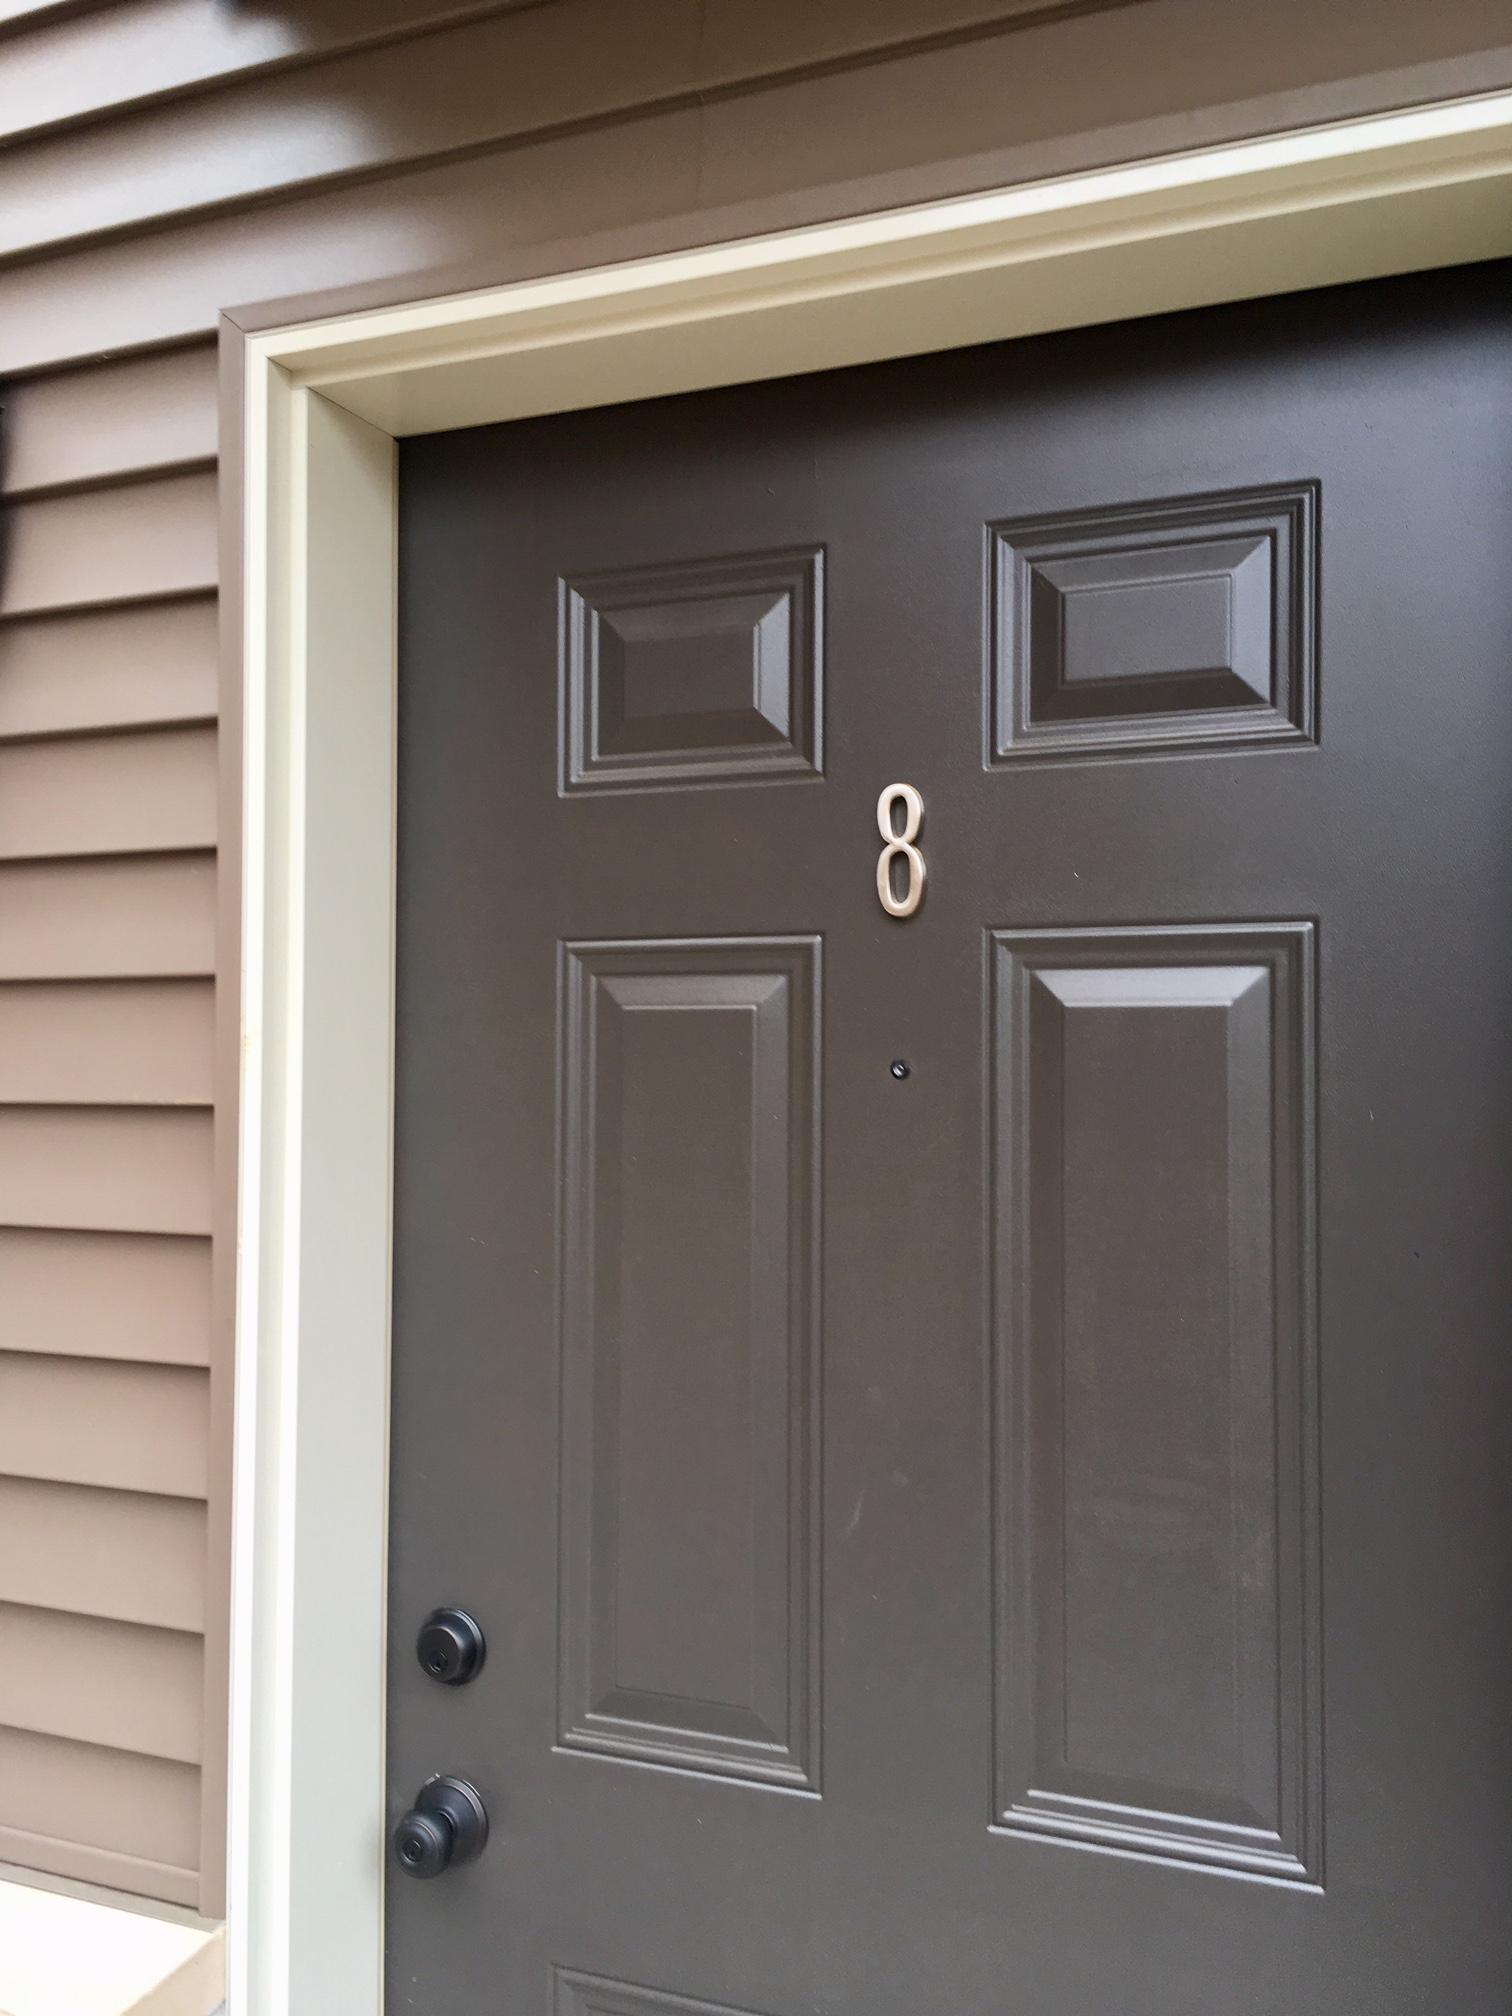 Numbers on doors.jpeg